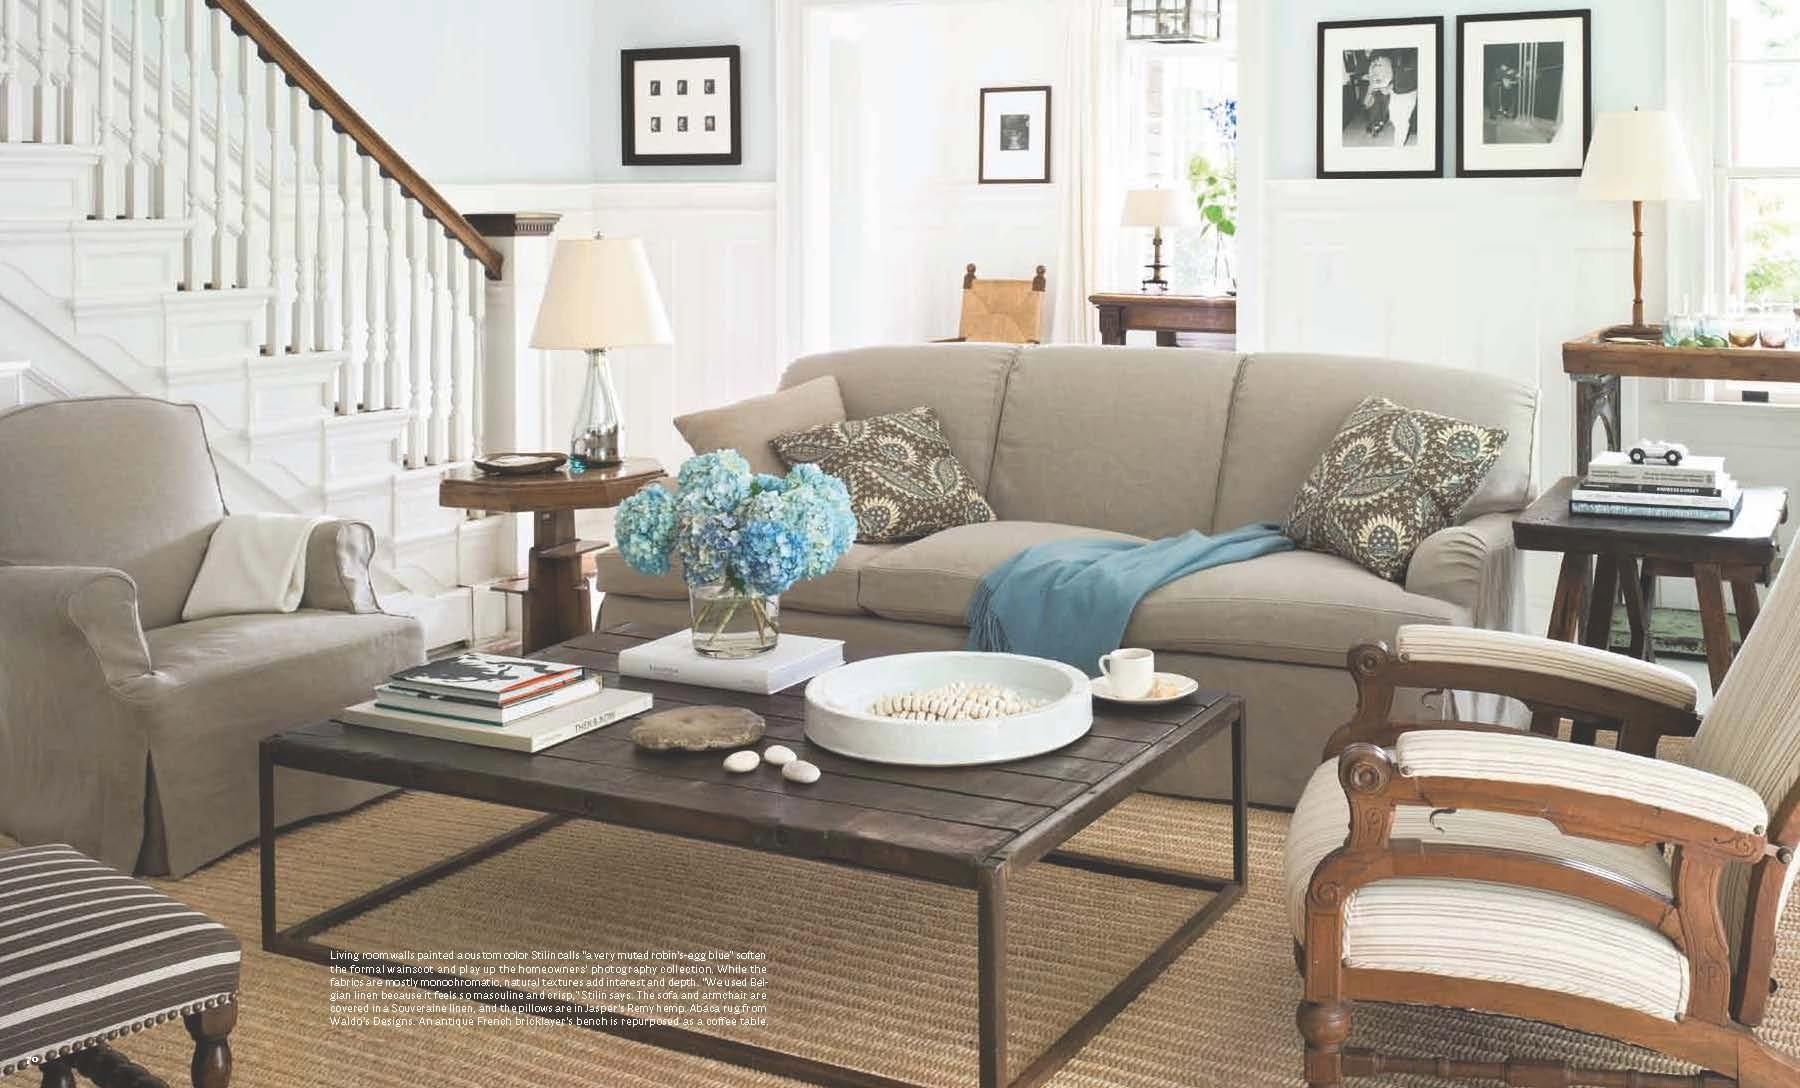 Robert Stilin Design 2nd Floor Living Room Beautiful Sofas Cottage Style Shaker Style 2nd living room ideas